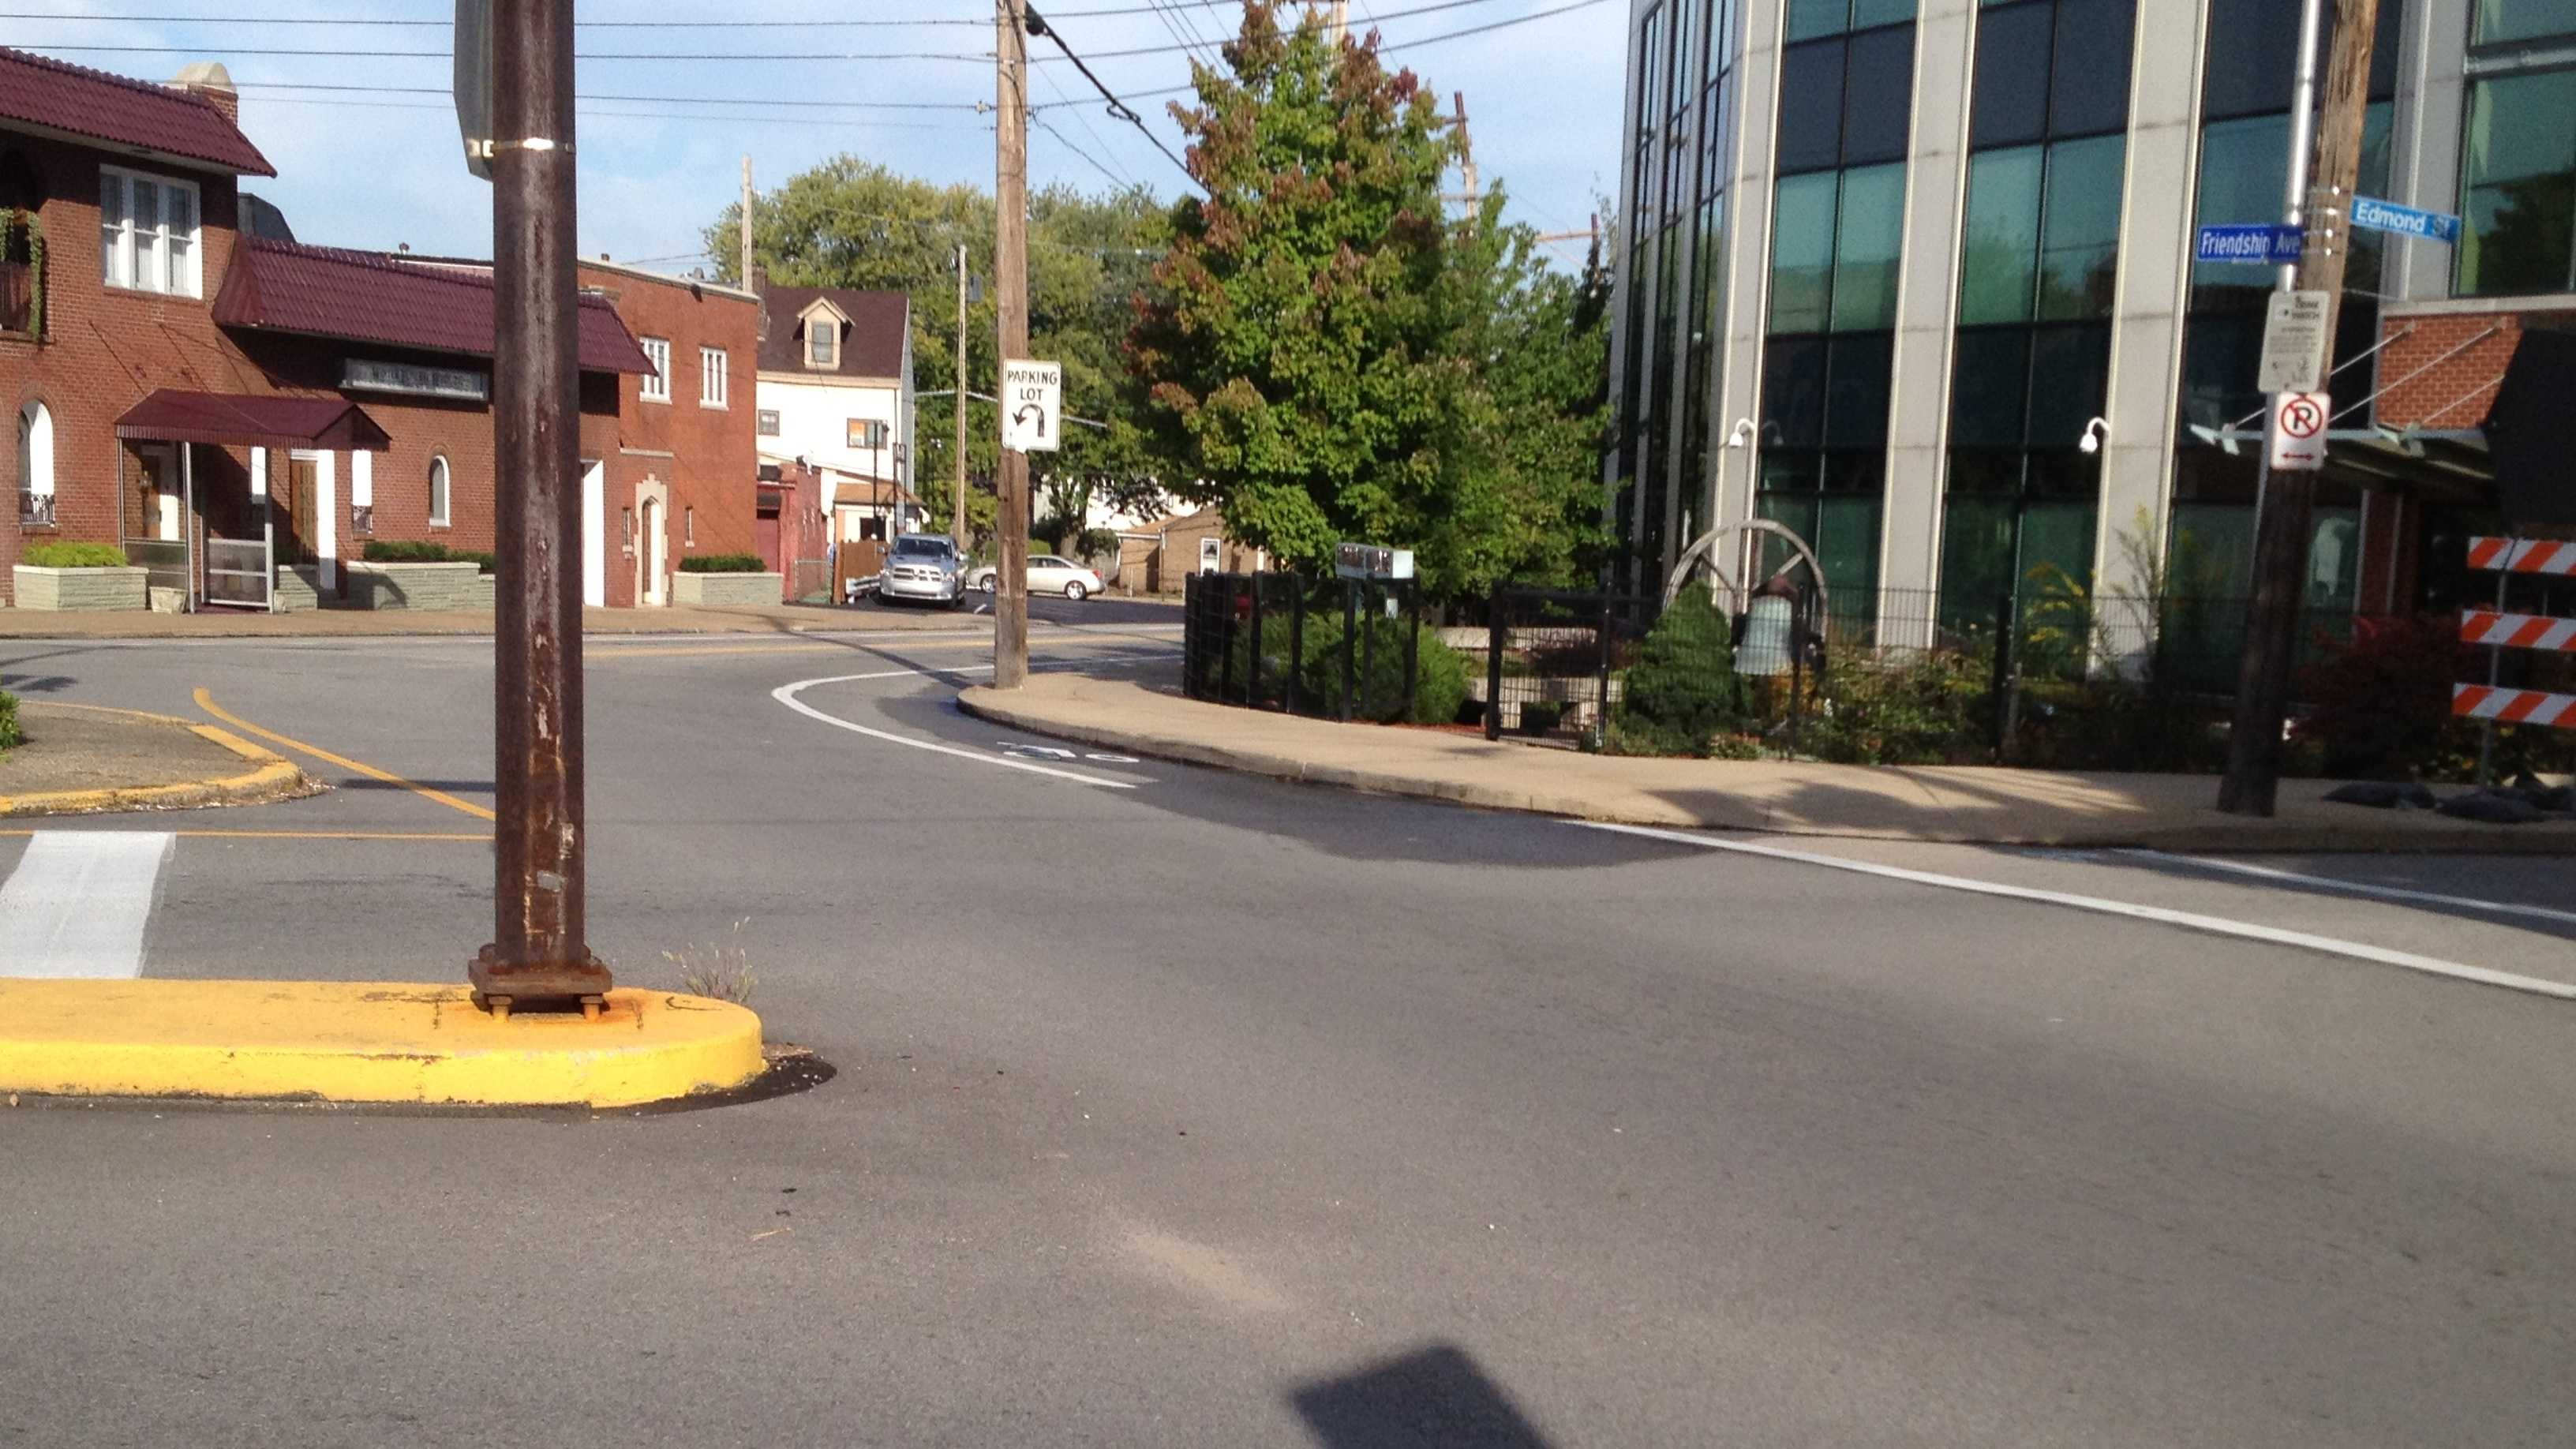 Bloomfield accident scene